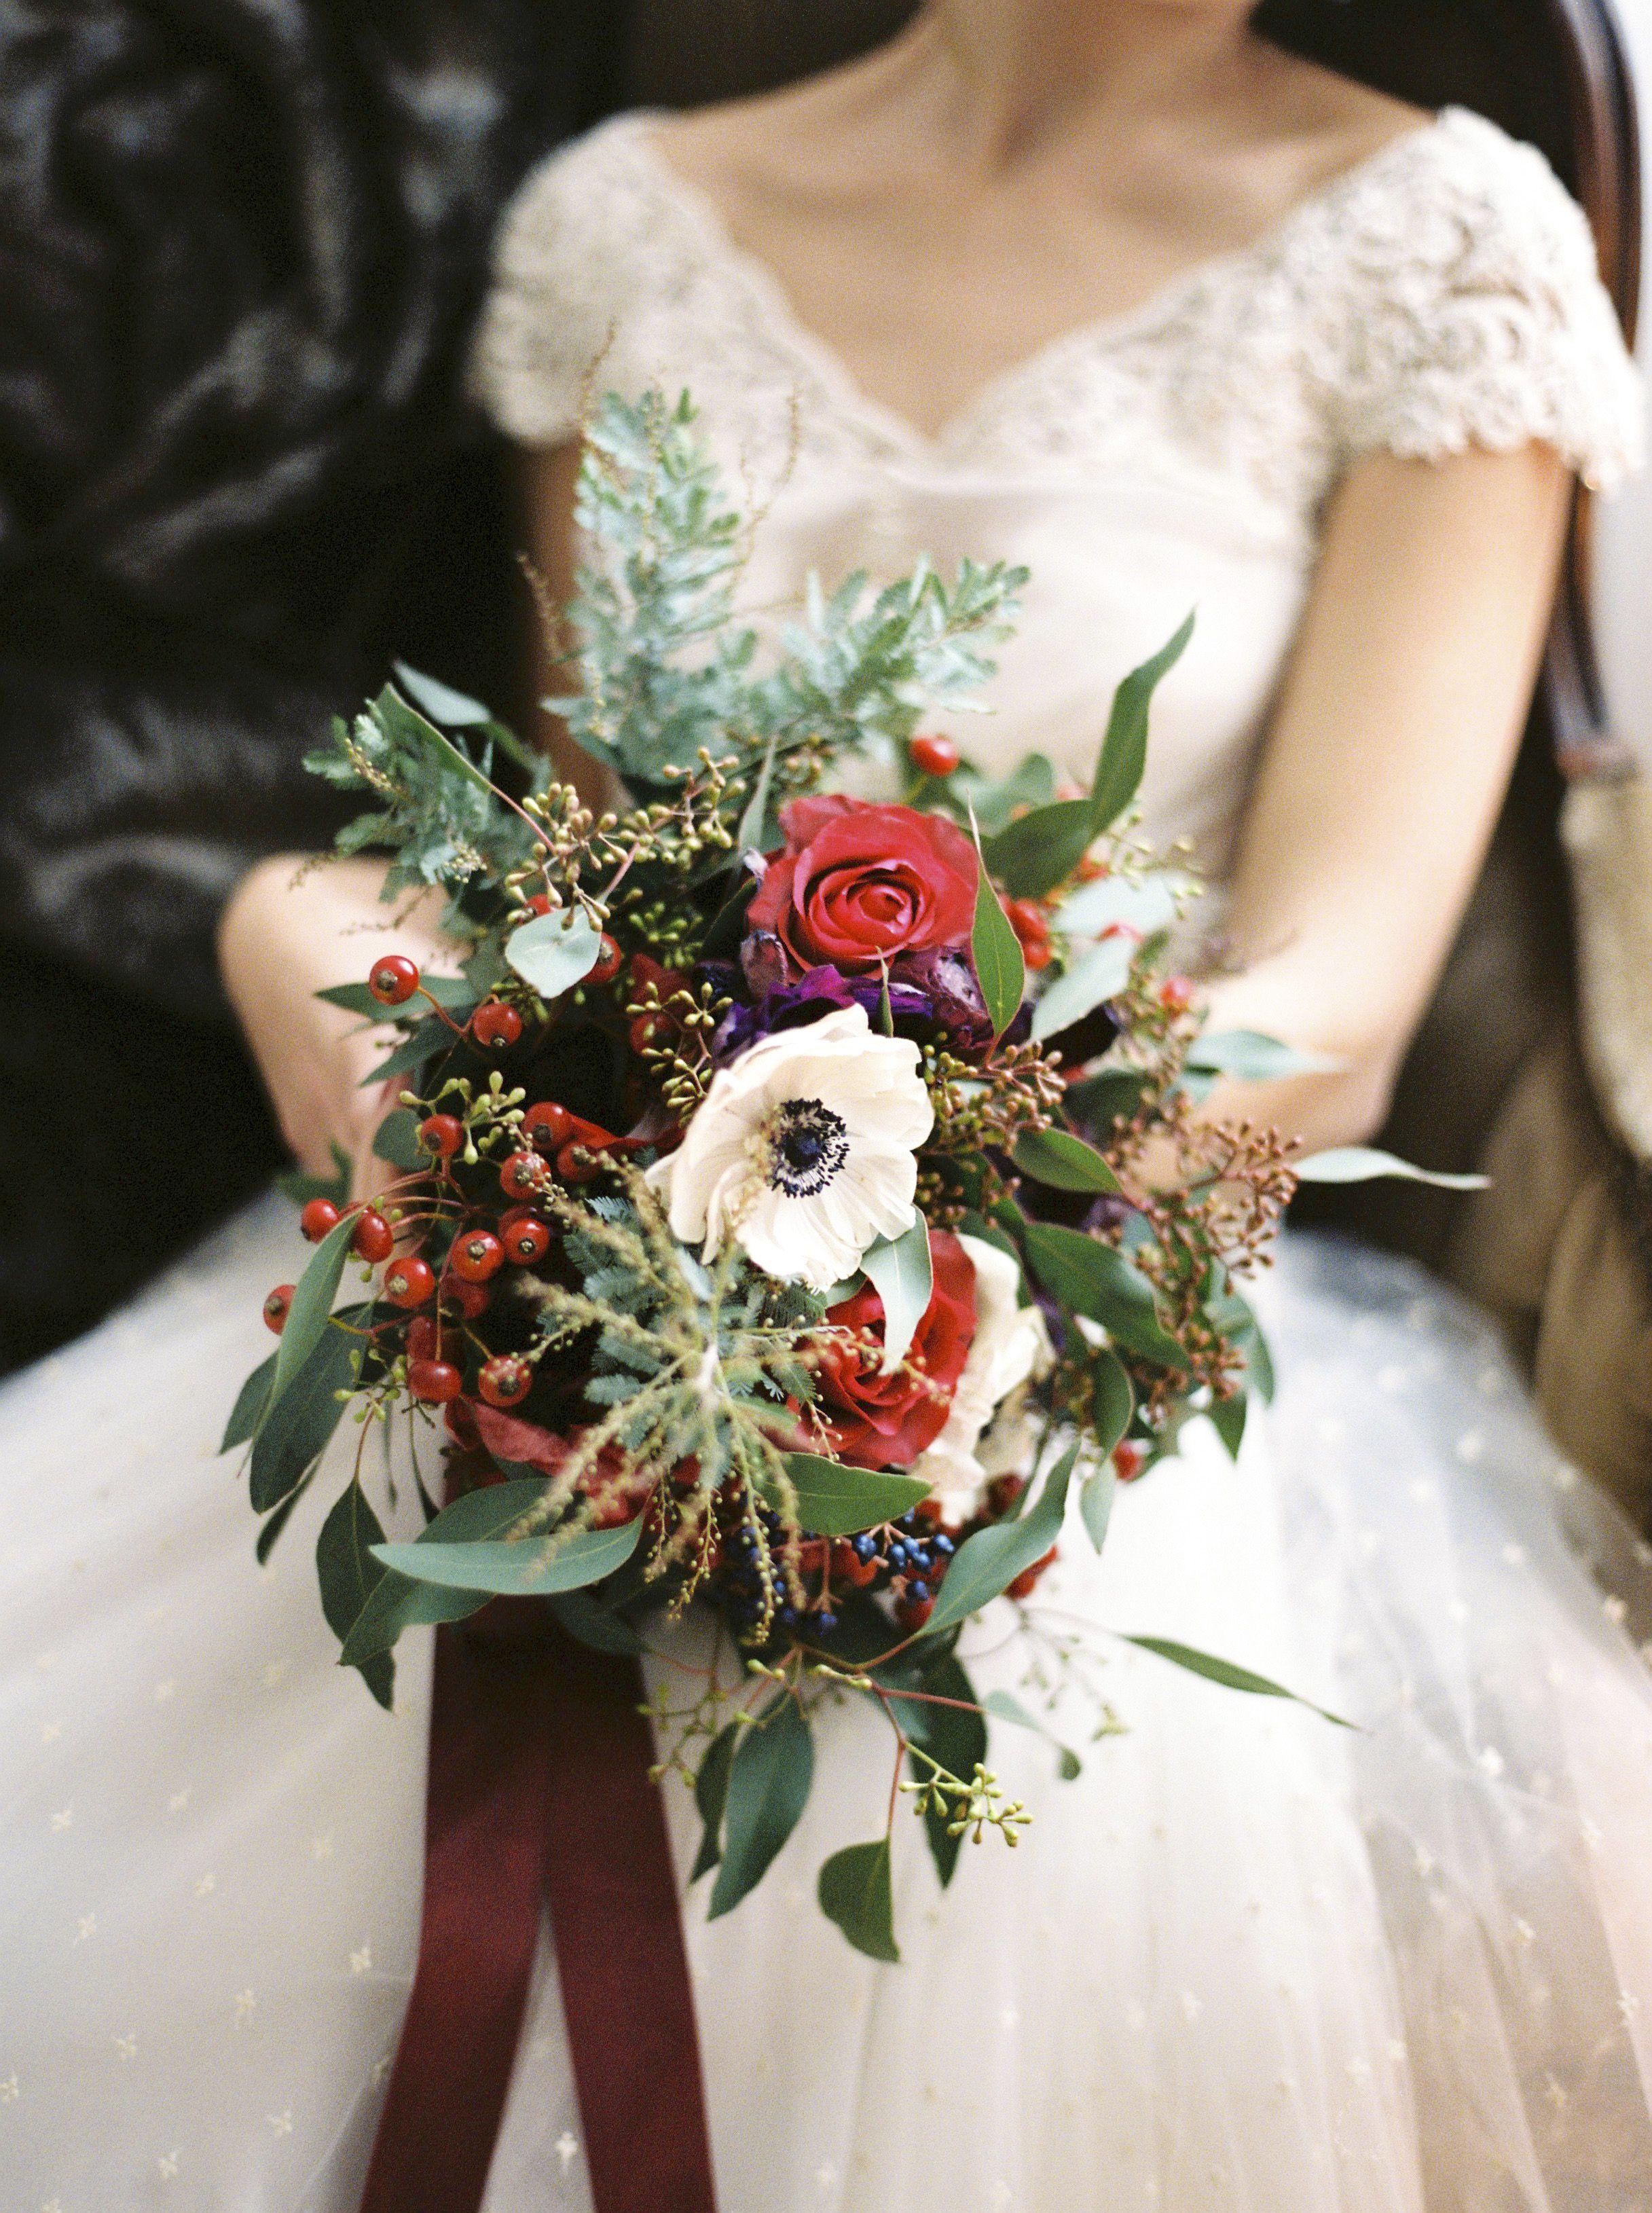 A Very Beloved Wedding Destination Wedding Planner Event Design Christmas Wedding Inspiration Winter Bridal Bouquets Winter Wedding Planning